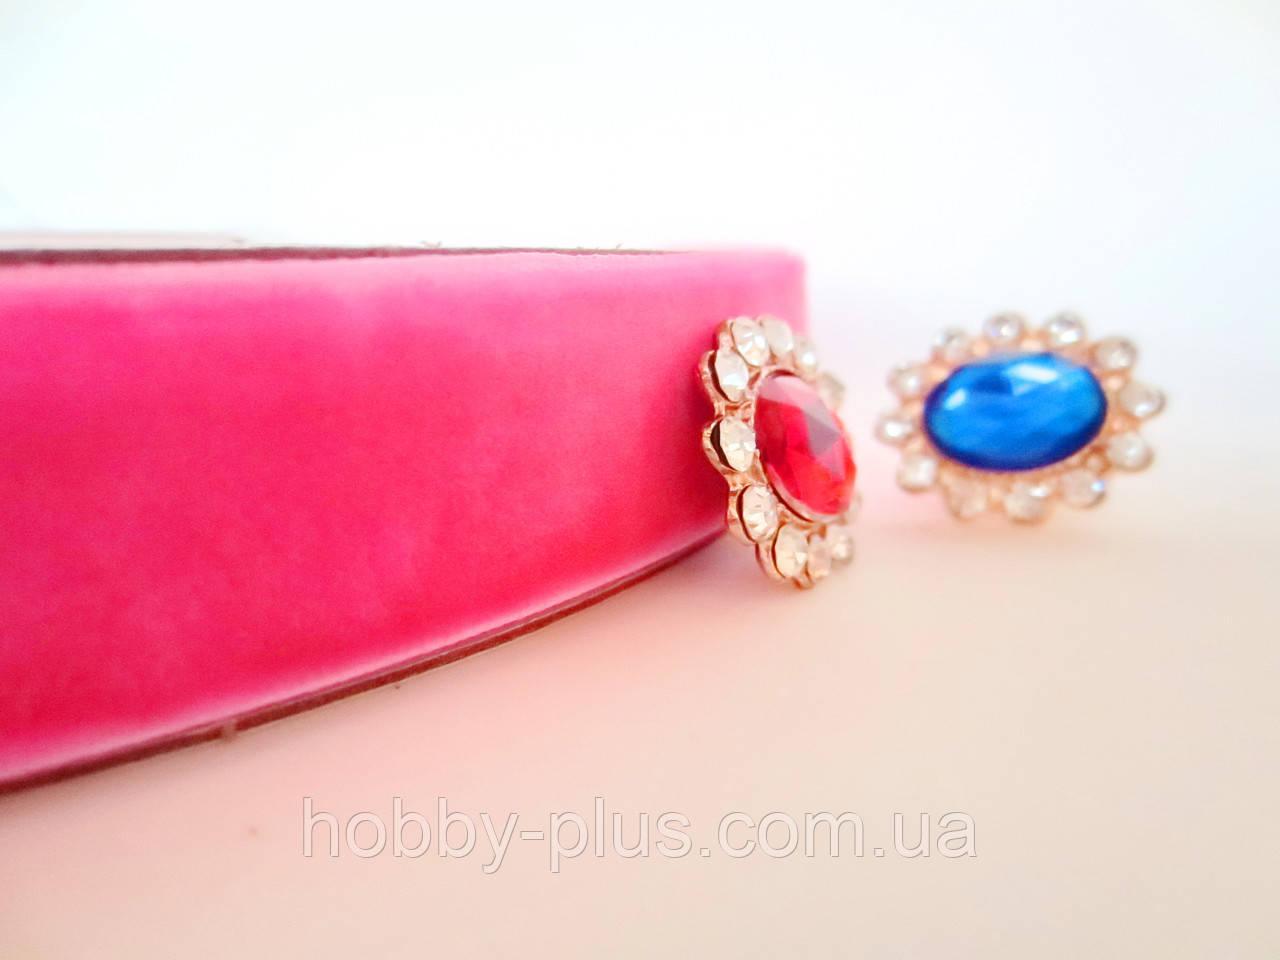 Лента бархатная, 2 см, цвет розовый, 1 м.